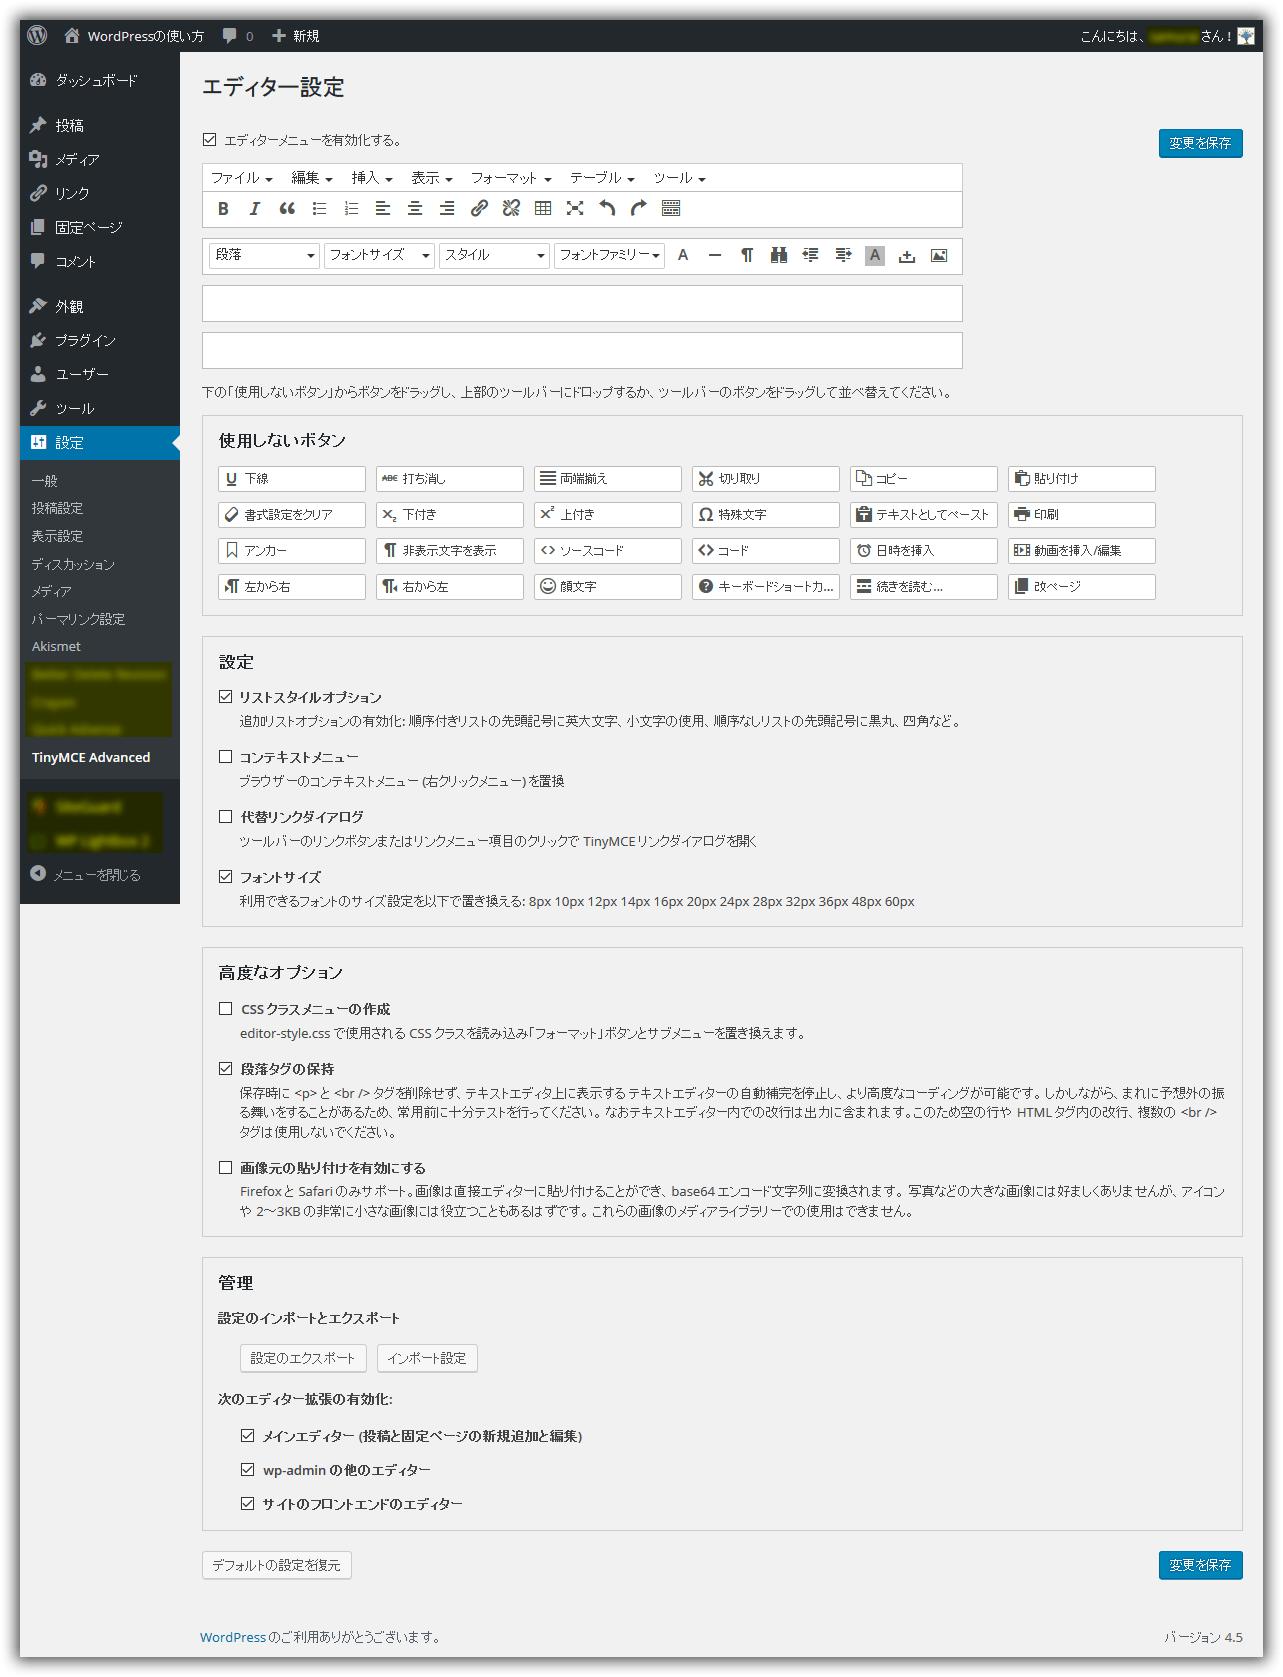 TinyMCE Advanced プラグインを日本語表示